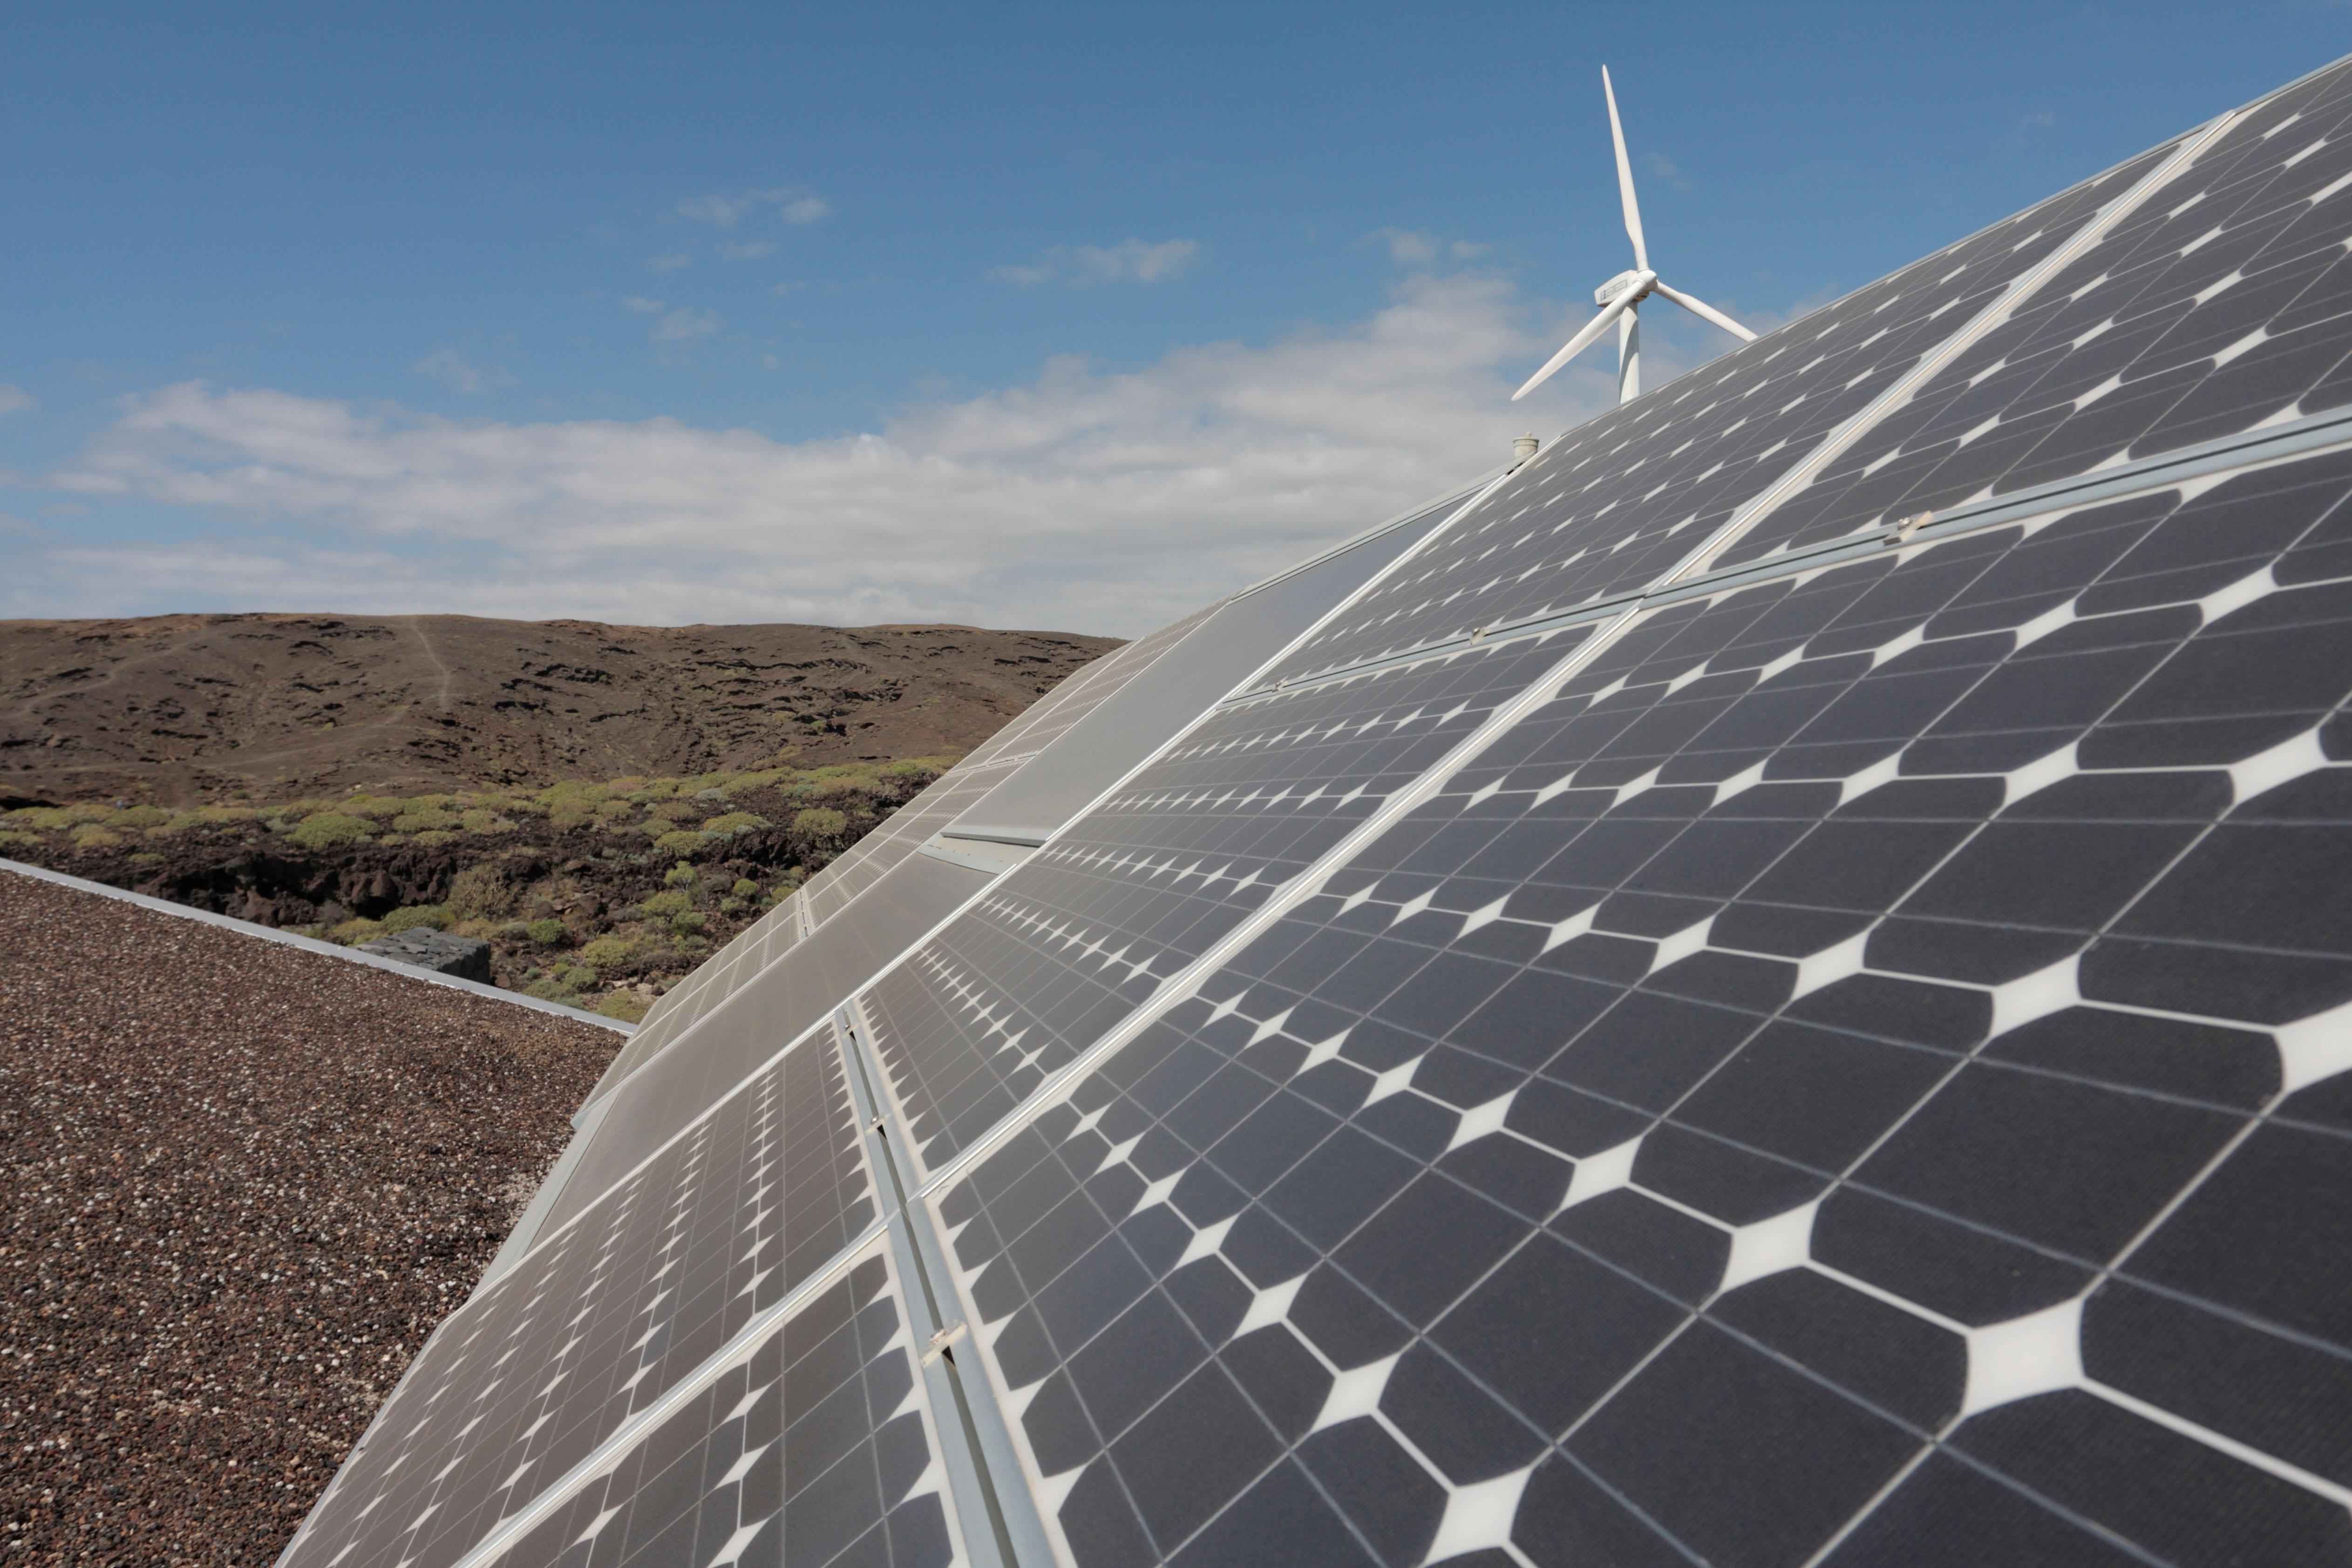 diplomatura en gesti u00f3n de energ u00edas renovables